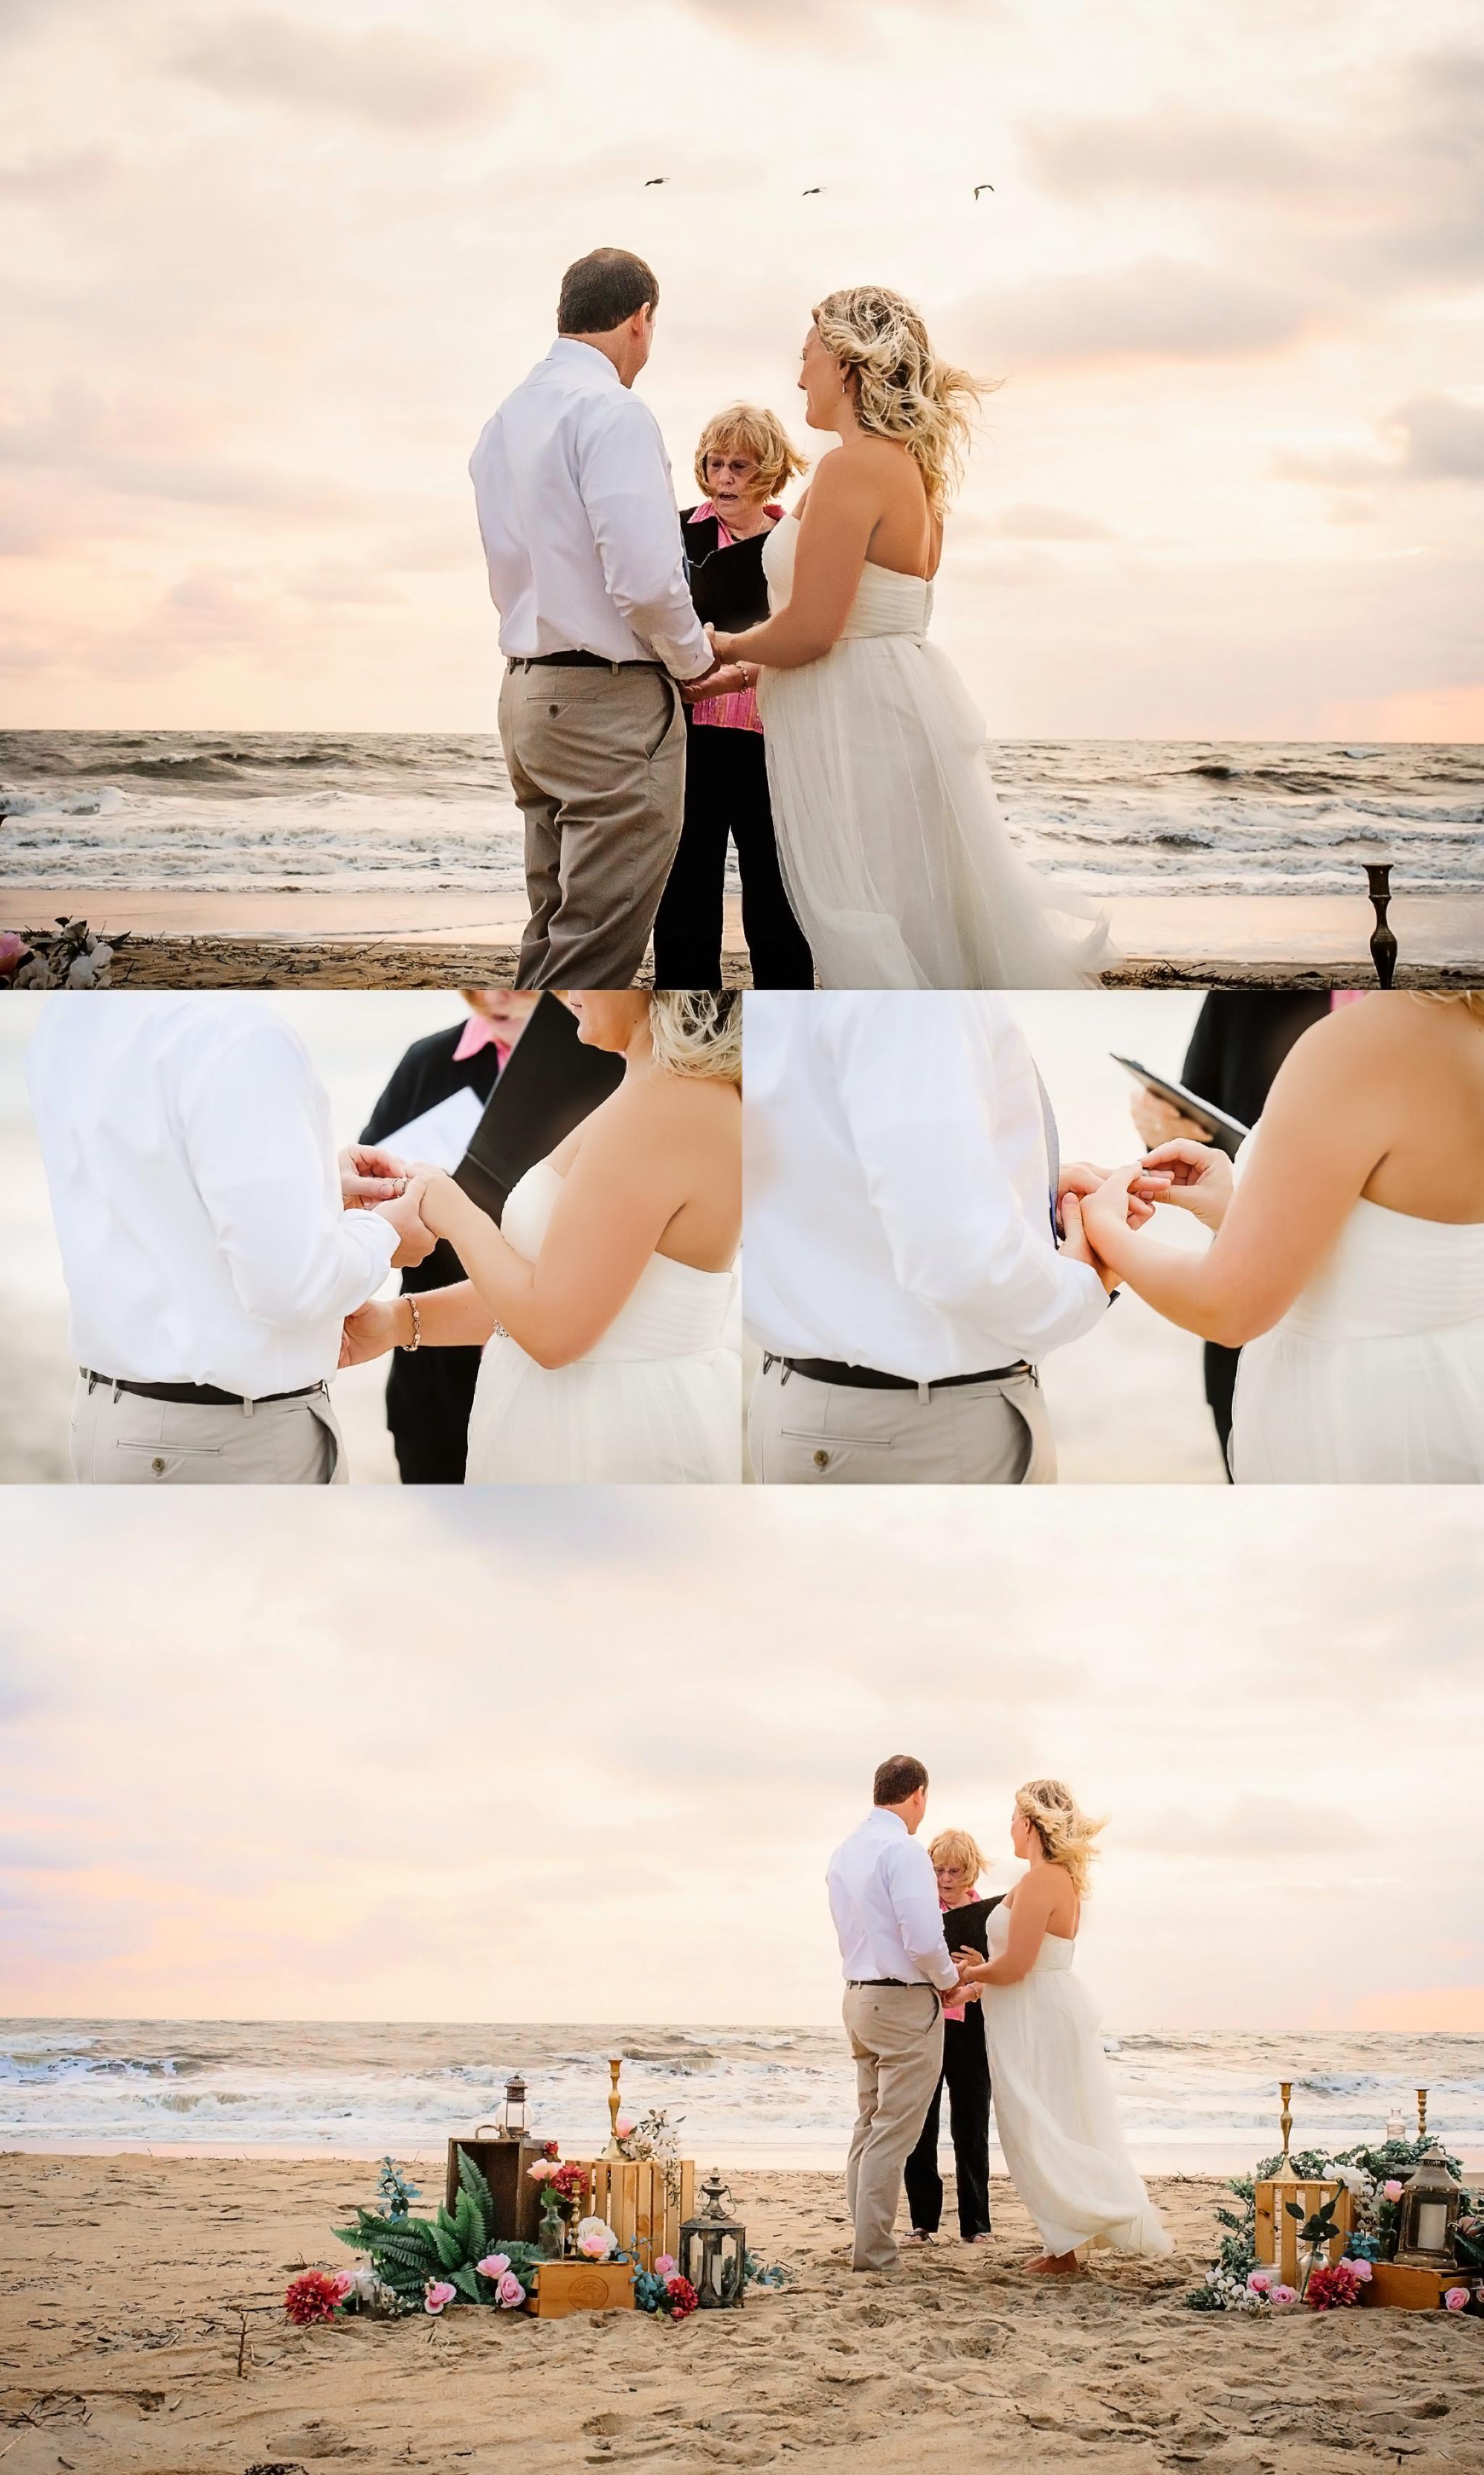 virginia-beach-wedding-photographer-melissa-bliss-photography-sandbridge-norfolk-portsmouth-chesapeake-suffolk-wedding-photographer-documentary-wedding-photography-hampton-roads-va